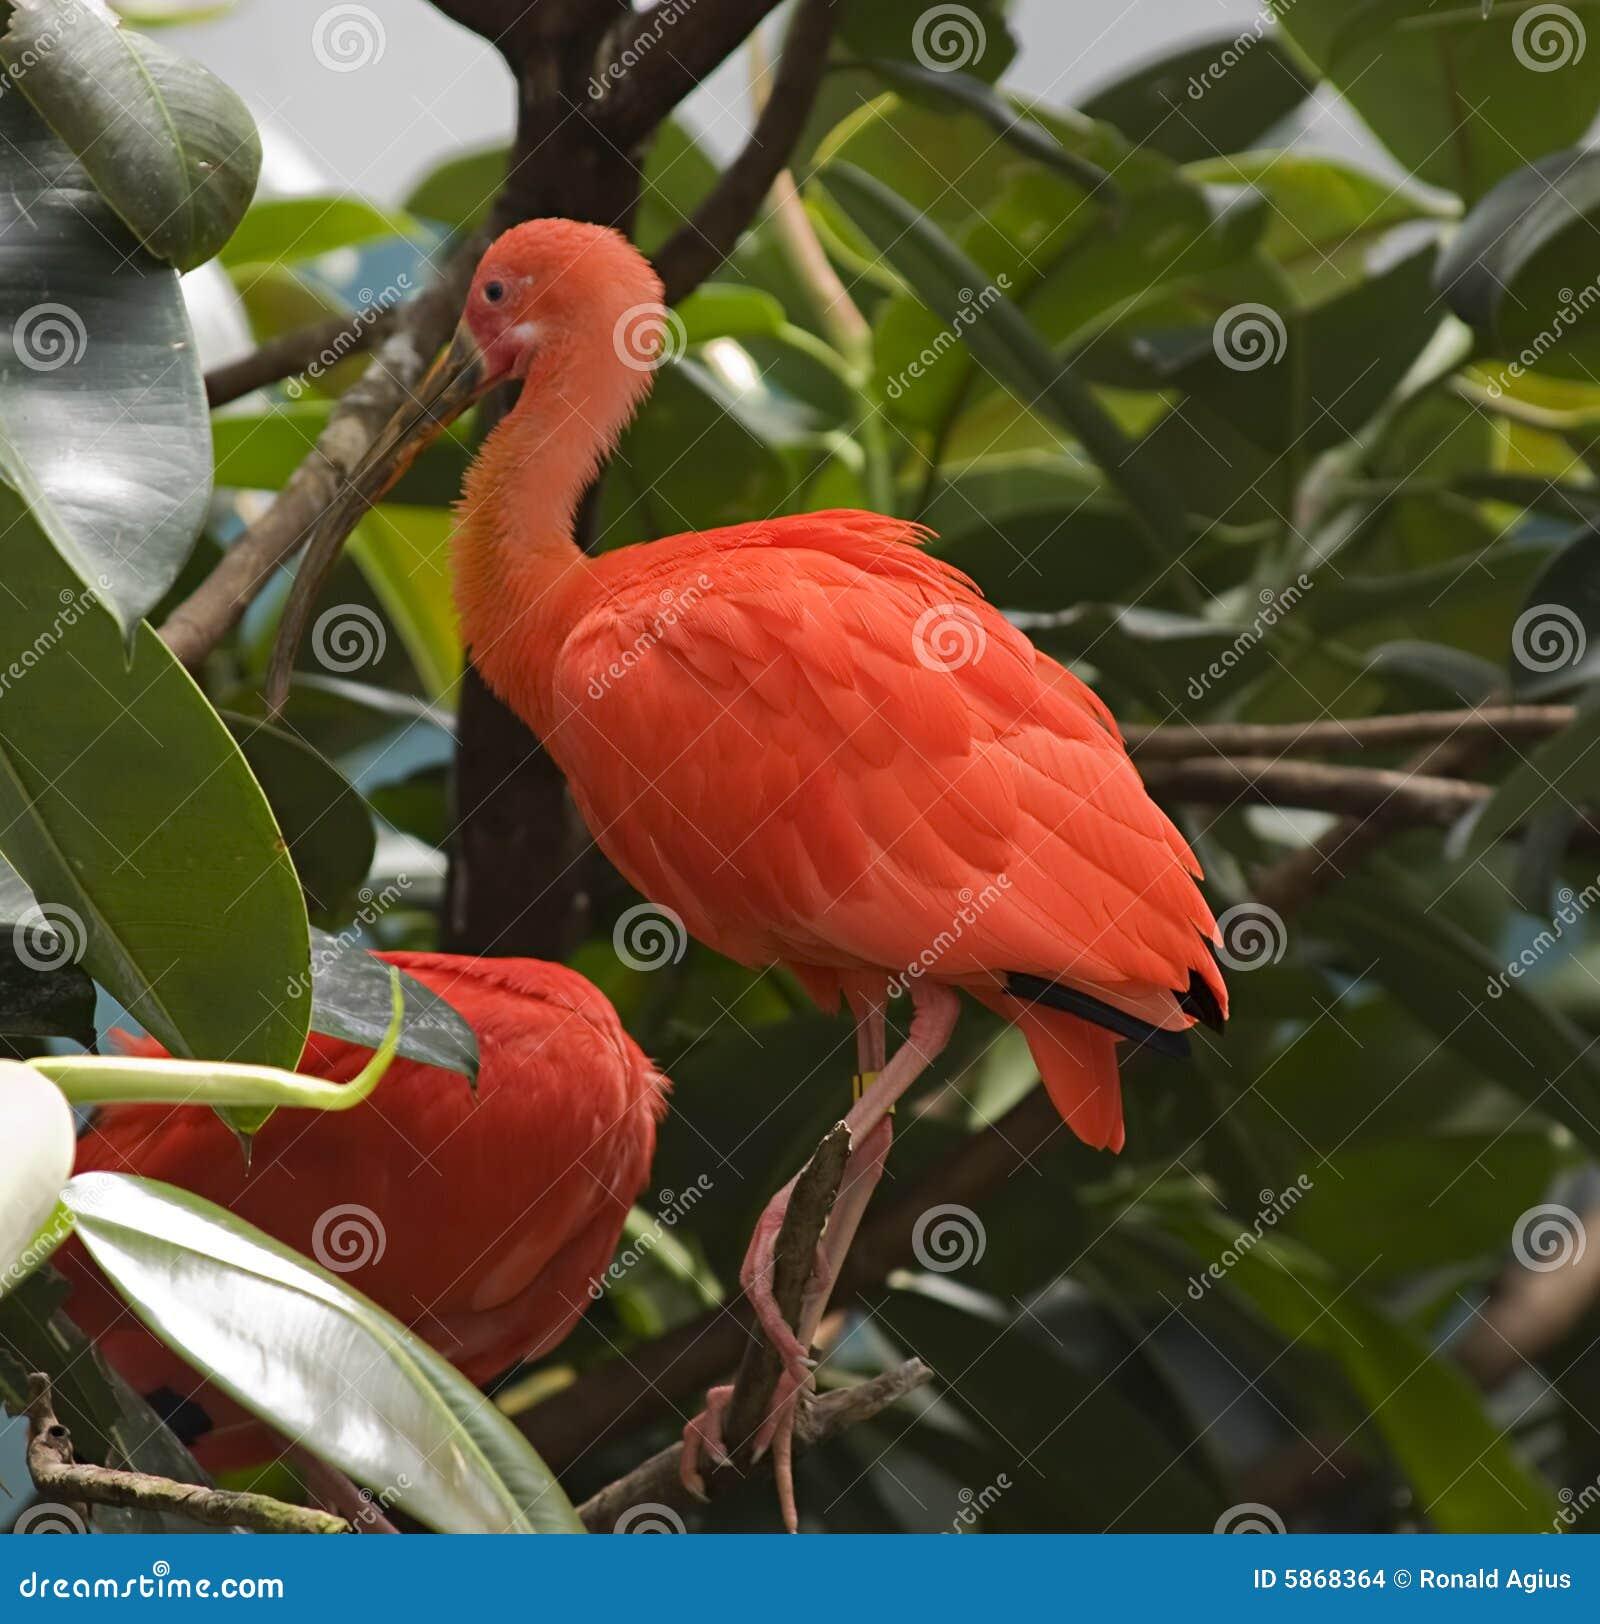 Oiseau exotique orange images stock image 5868364 for Oiseau bleu et orange